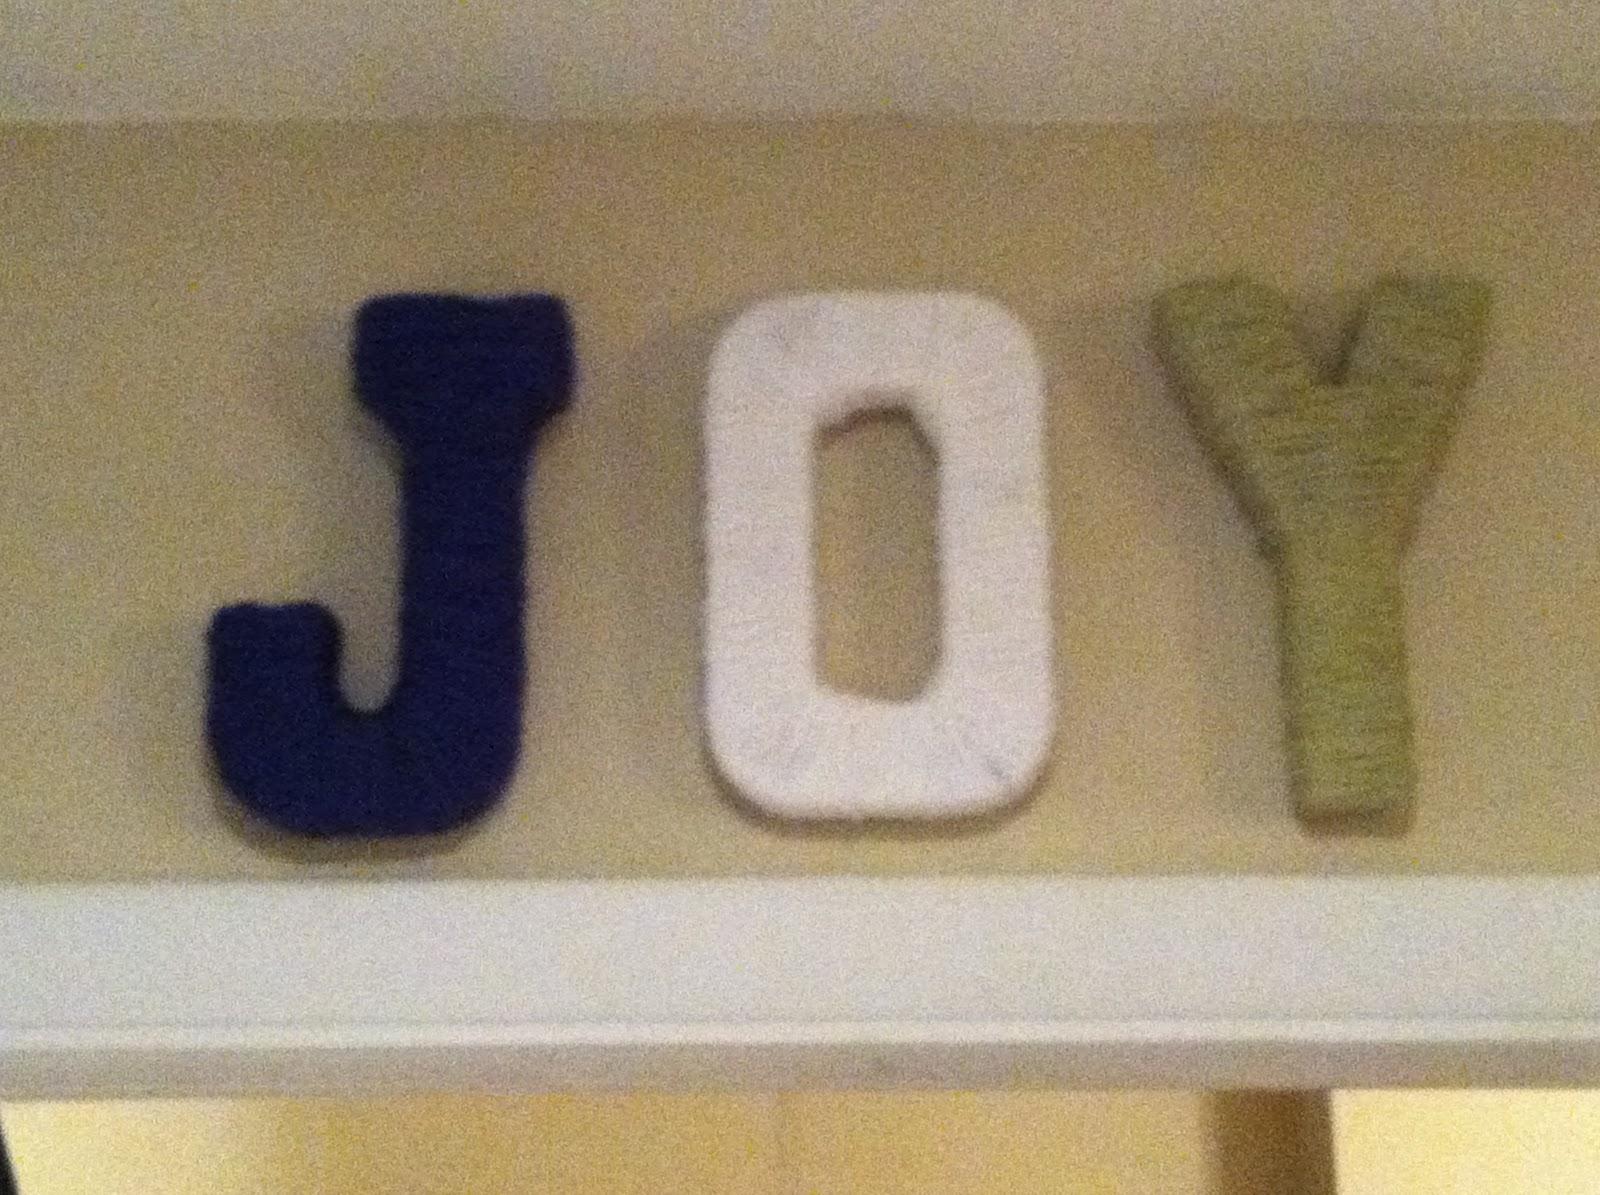 Jaci lou yarn letters x mas decoration for Decoration 11 letters